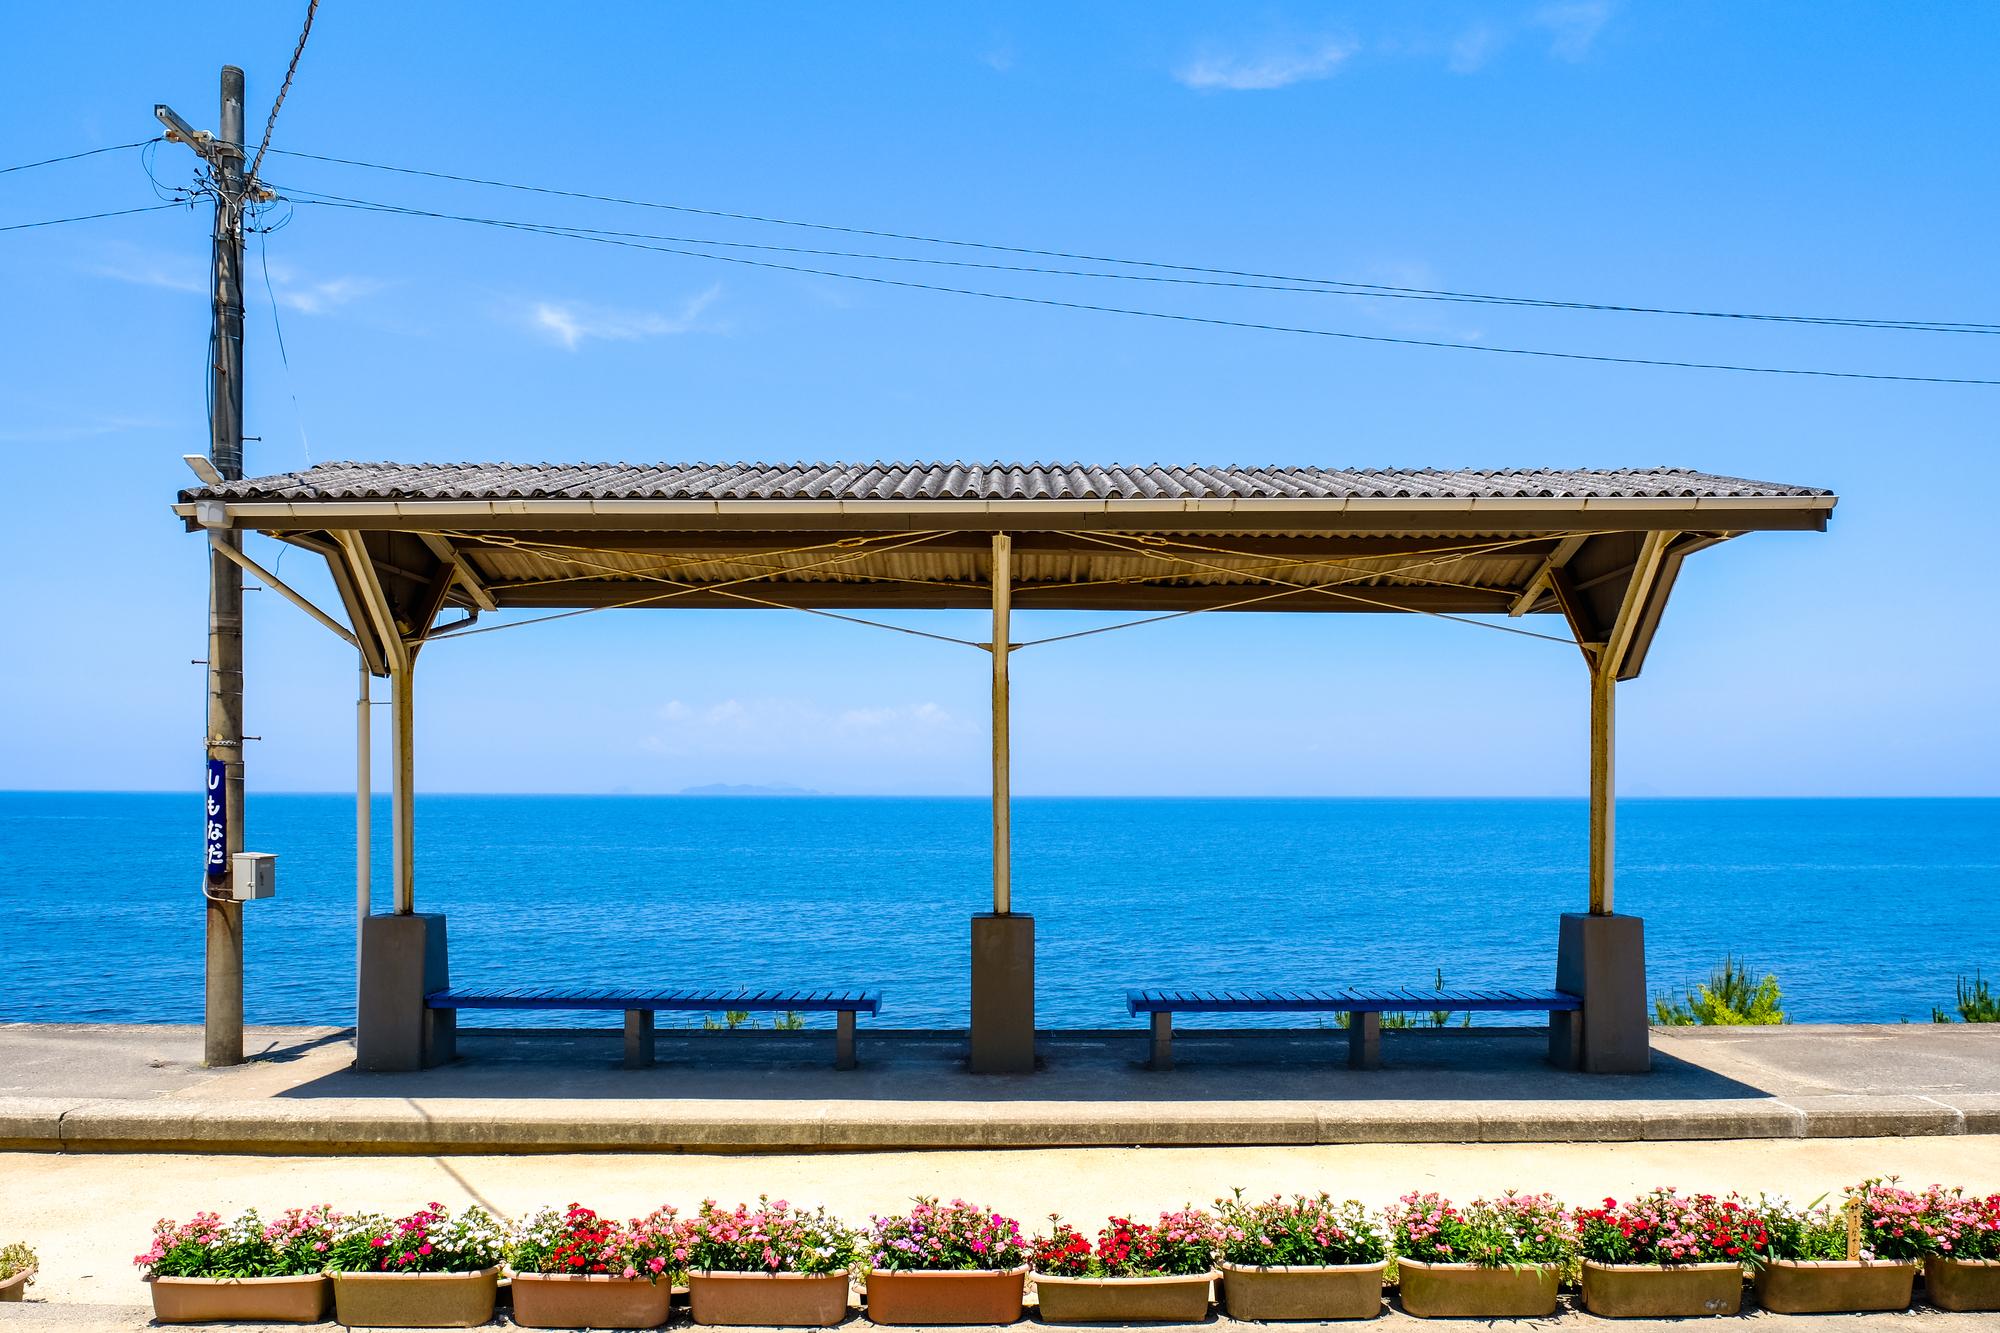 Shimonada Station and the Seto Inland Sea